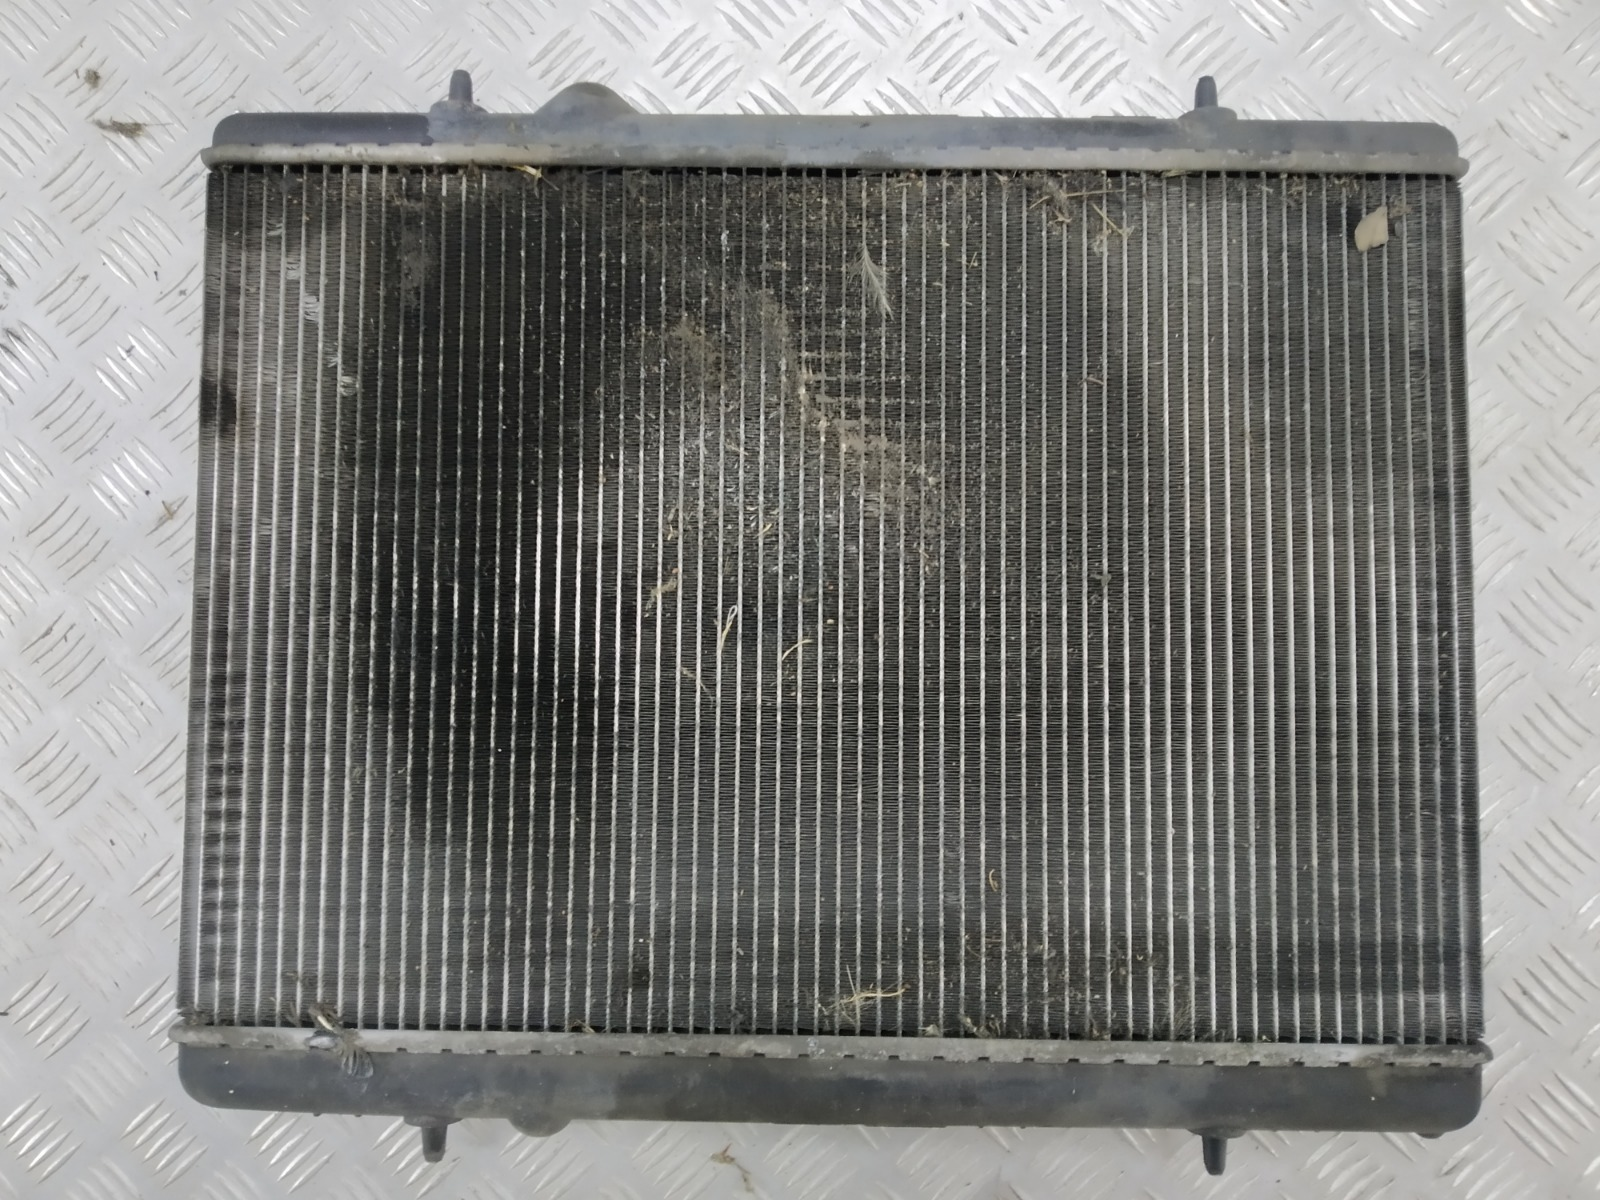 Радиатор (основной) Citroen Xsara Picasso 1.6 HDI 2006 (б/у)